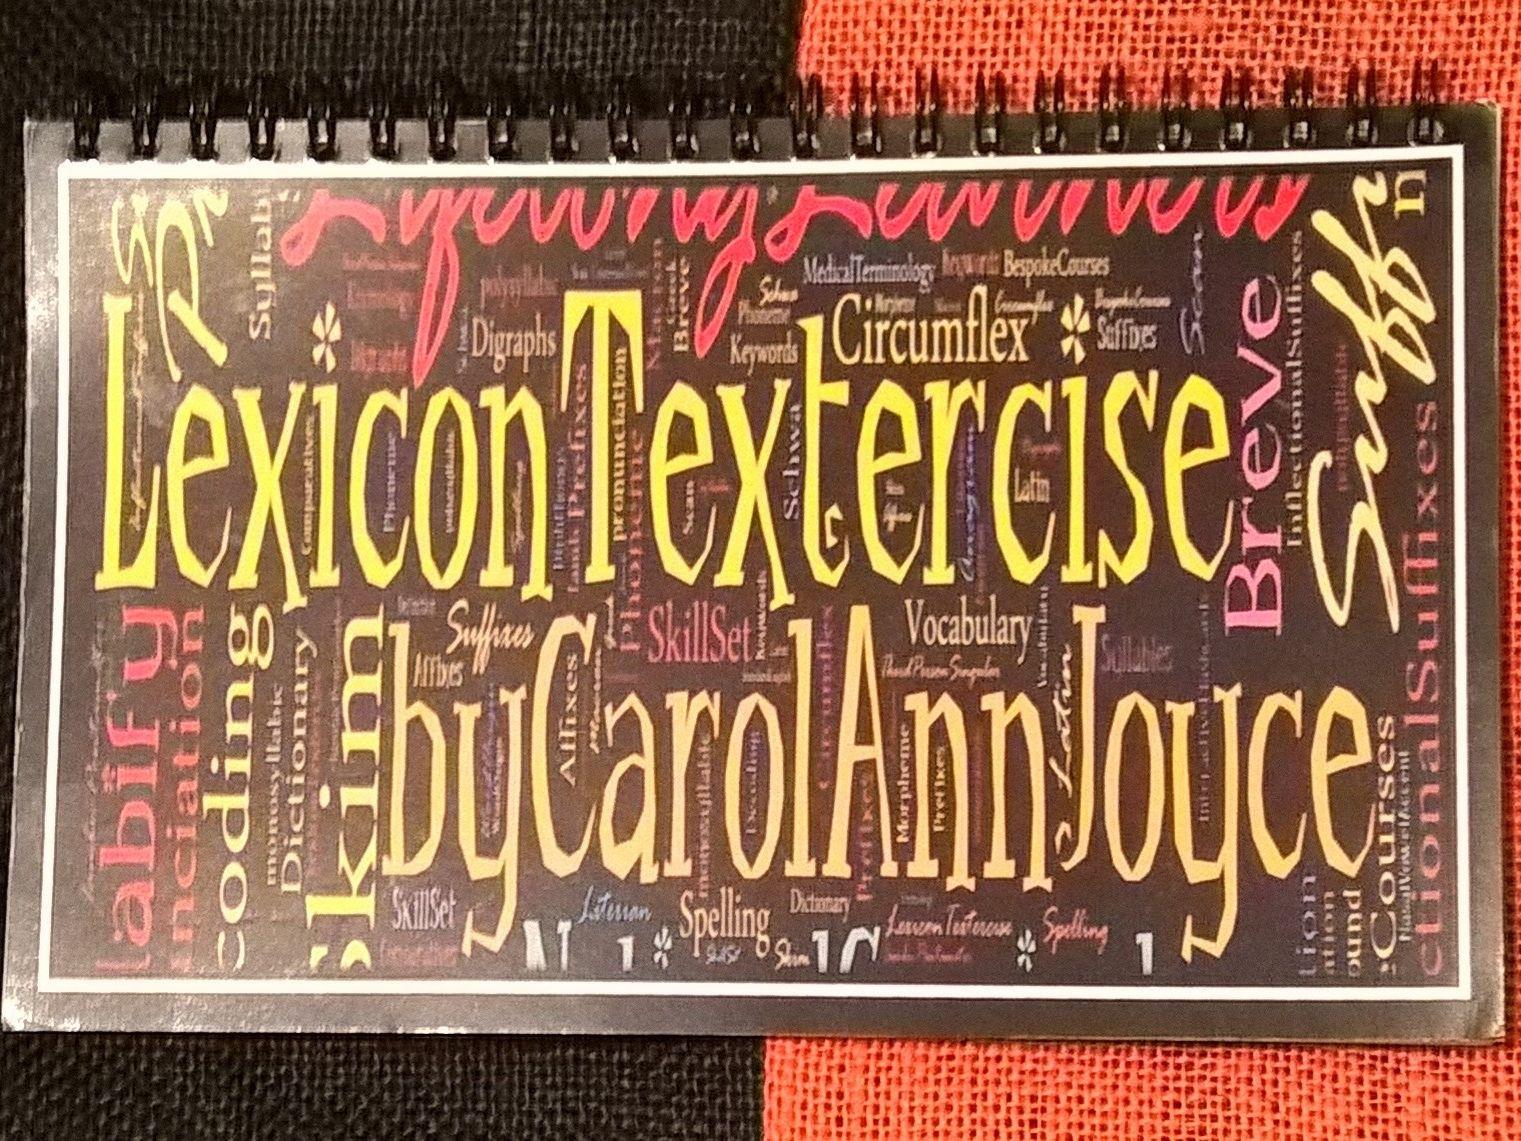 Literacy / Lexicology: Lexicon Textercise